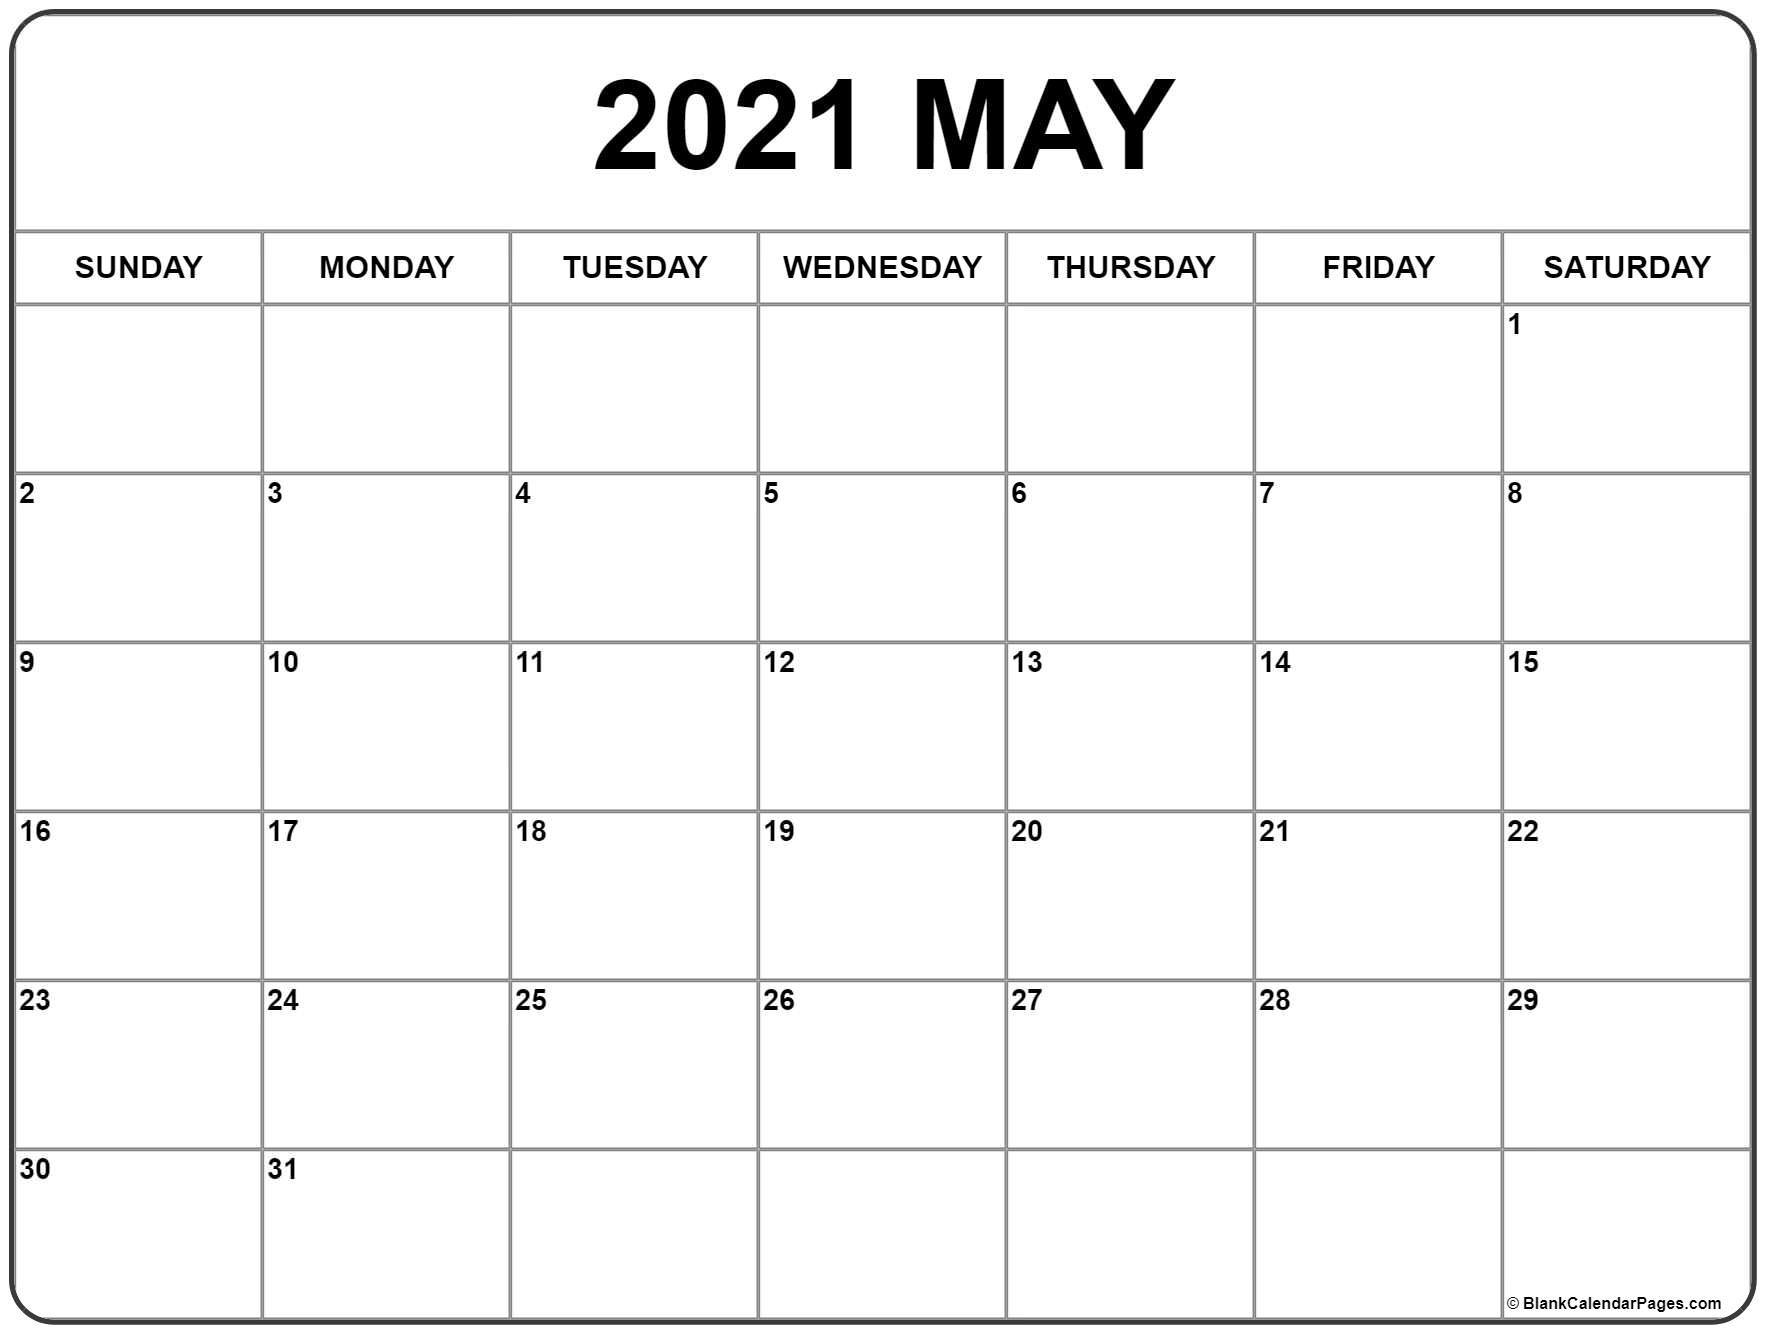 May 2021 Calendar   Free Printable Monthly Calendars-Free Monthly Calendar Printable 2021